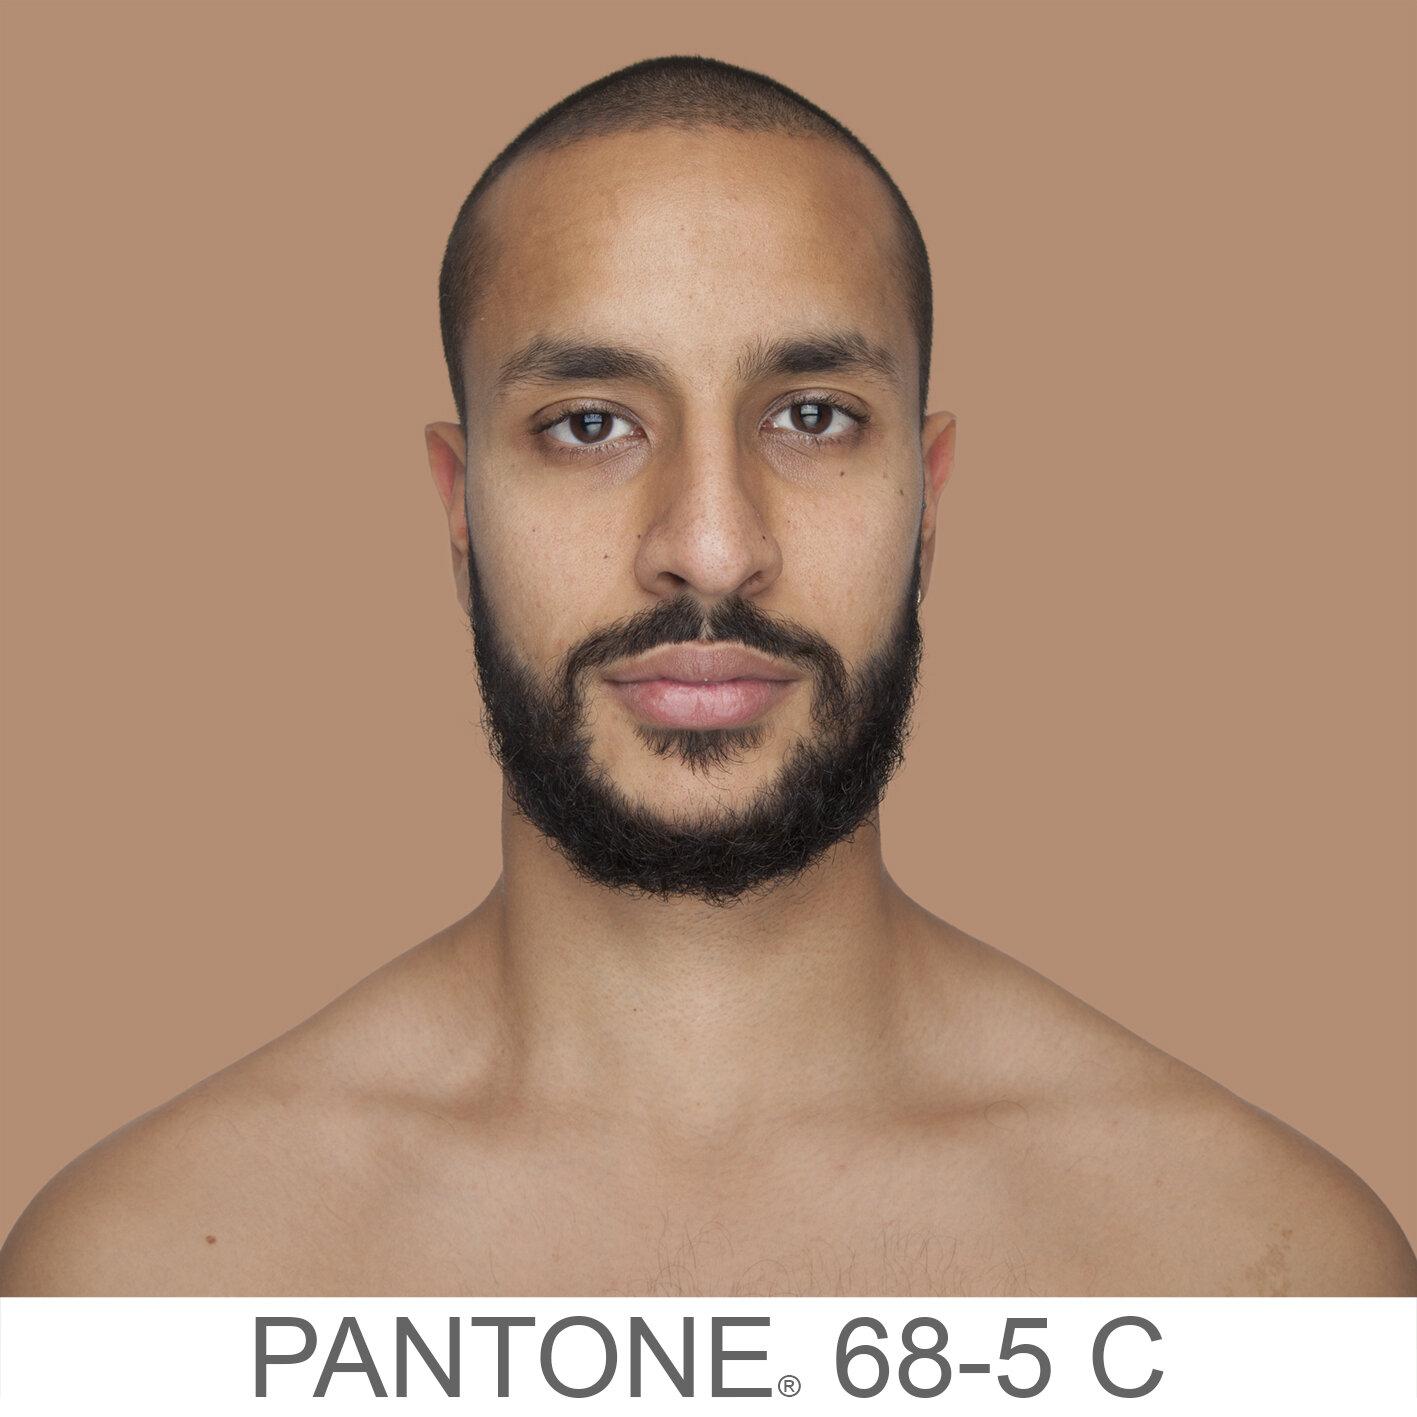 humanae 68-5 C LD copia.jpg